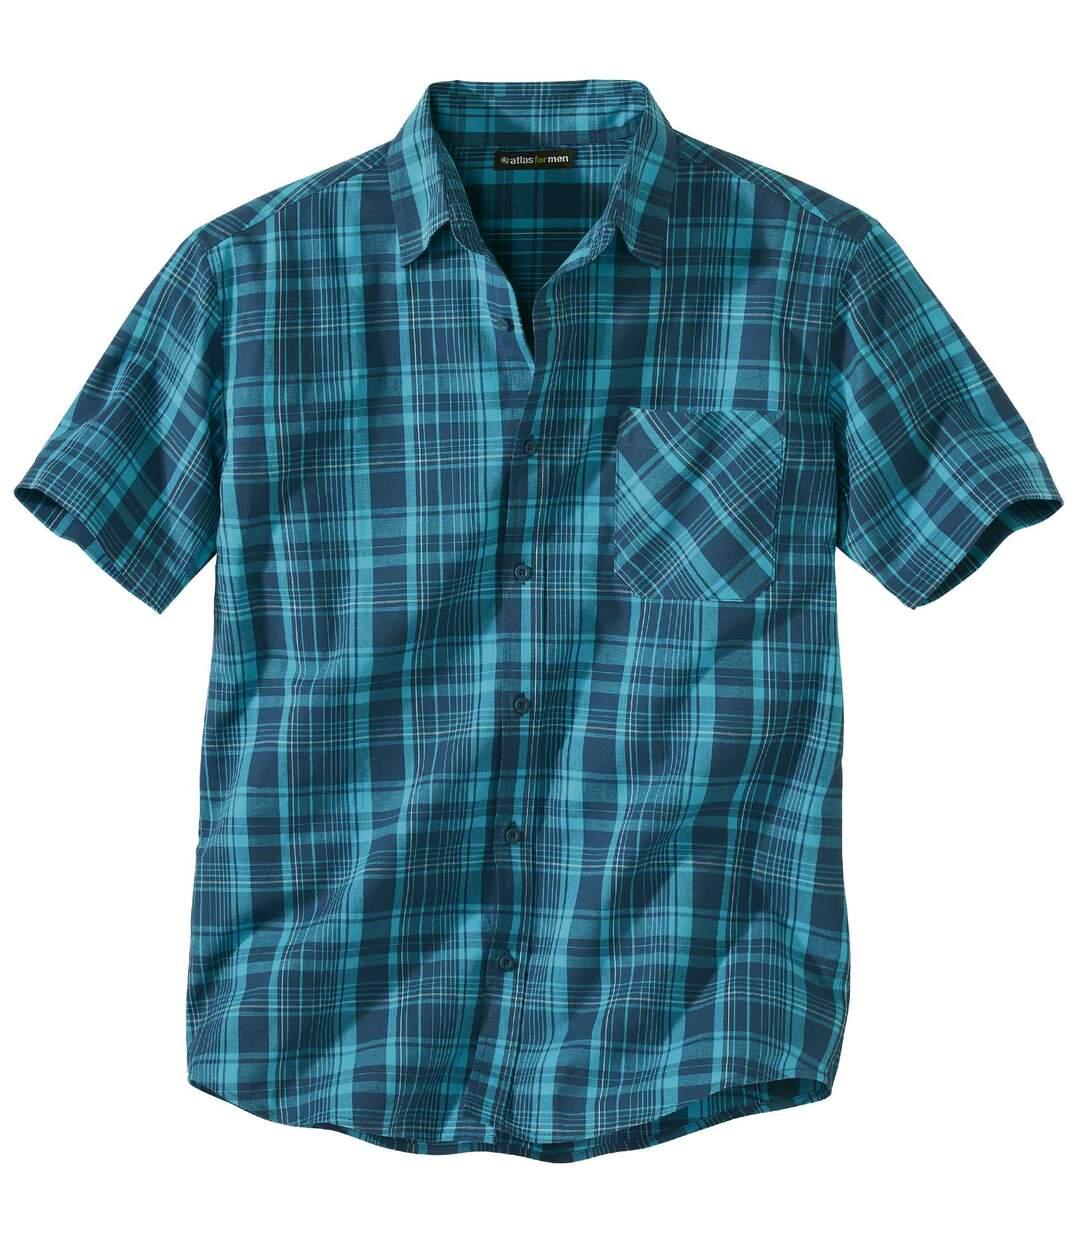 Men's Stretch Green Checked Shirt - Short-Sleeved